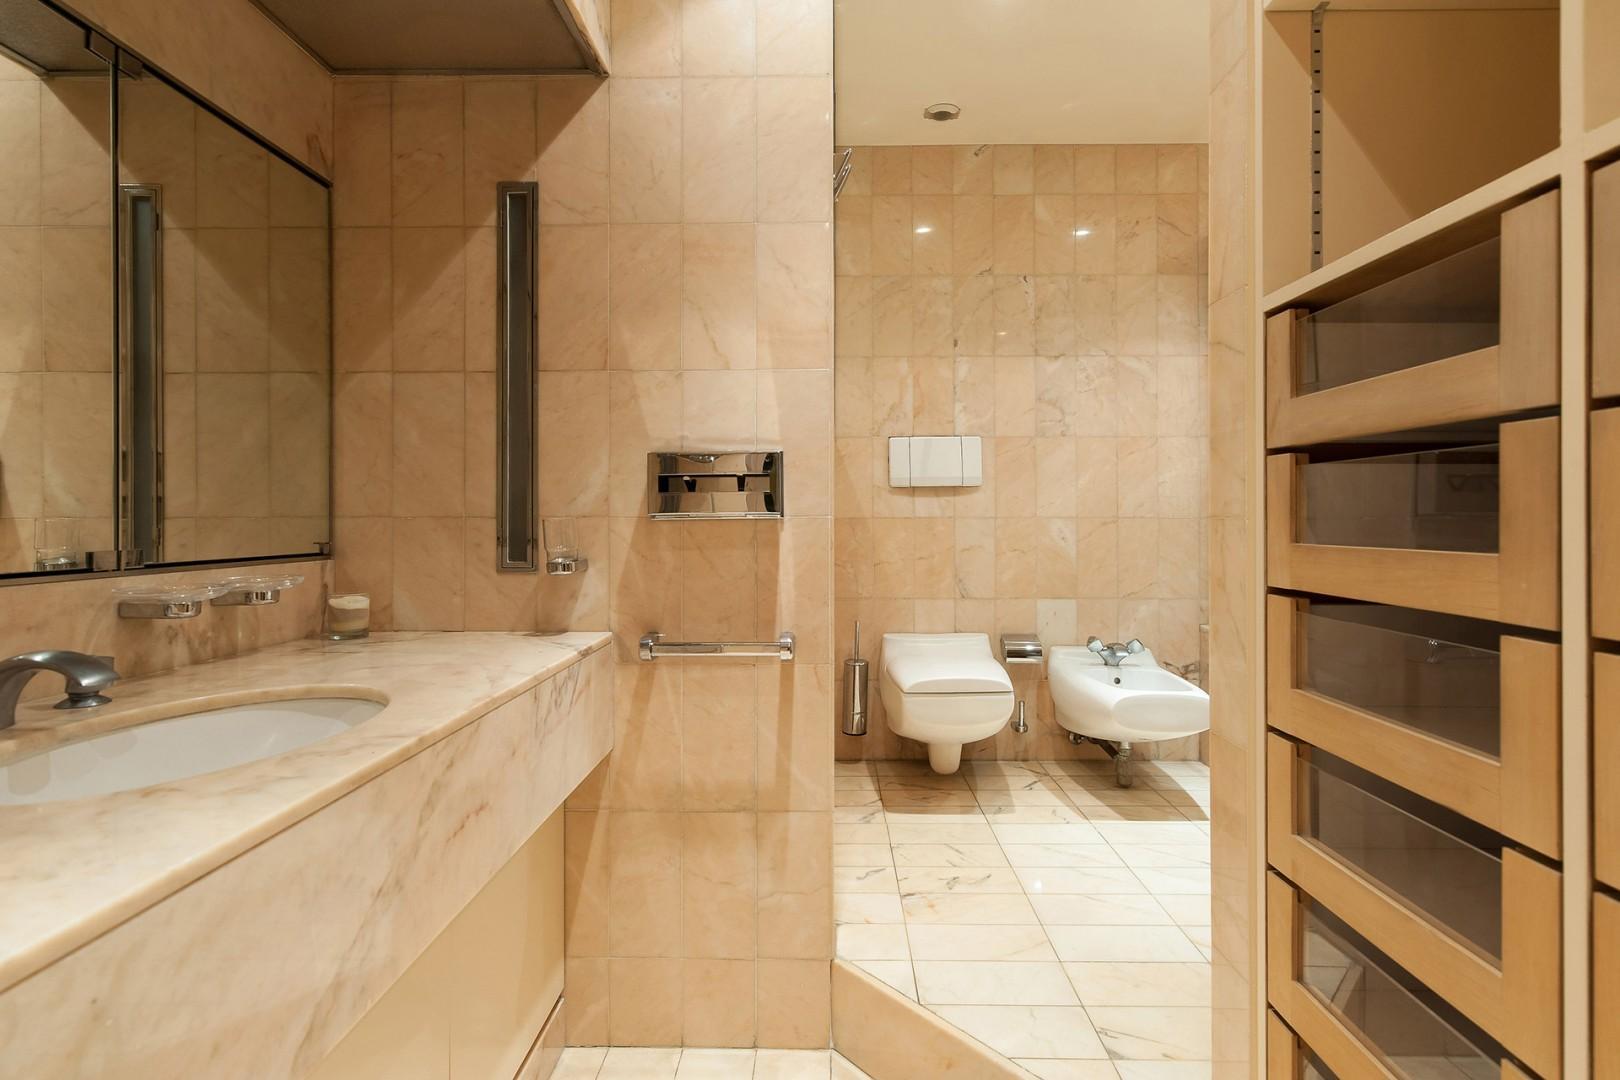 Pamper yourself in the luxurious en suite bathroom.